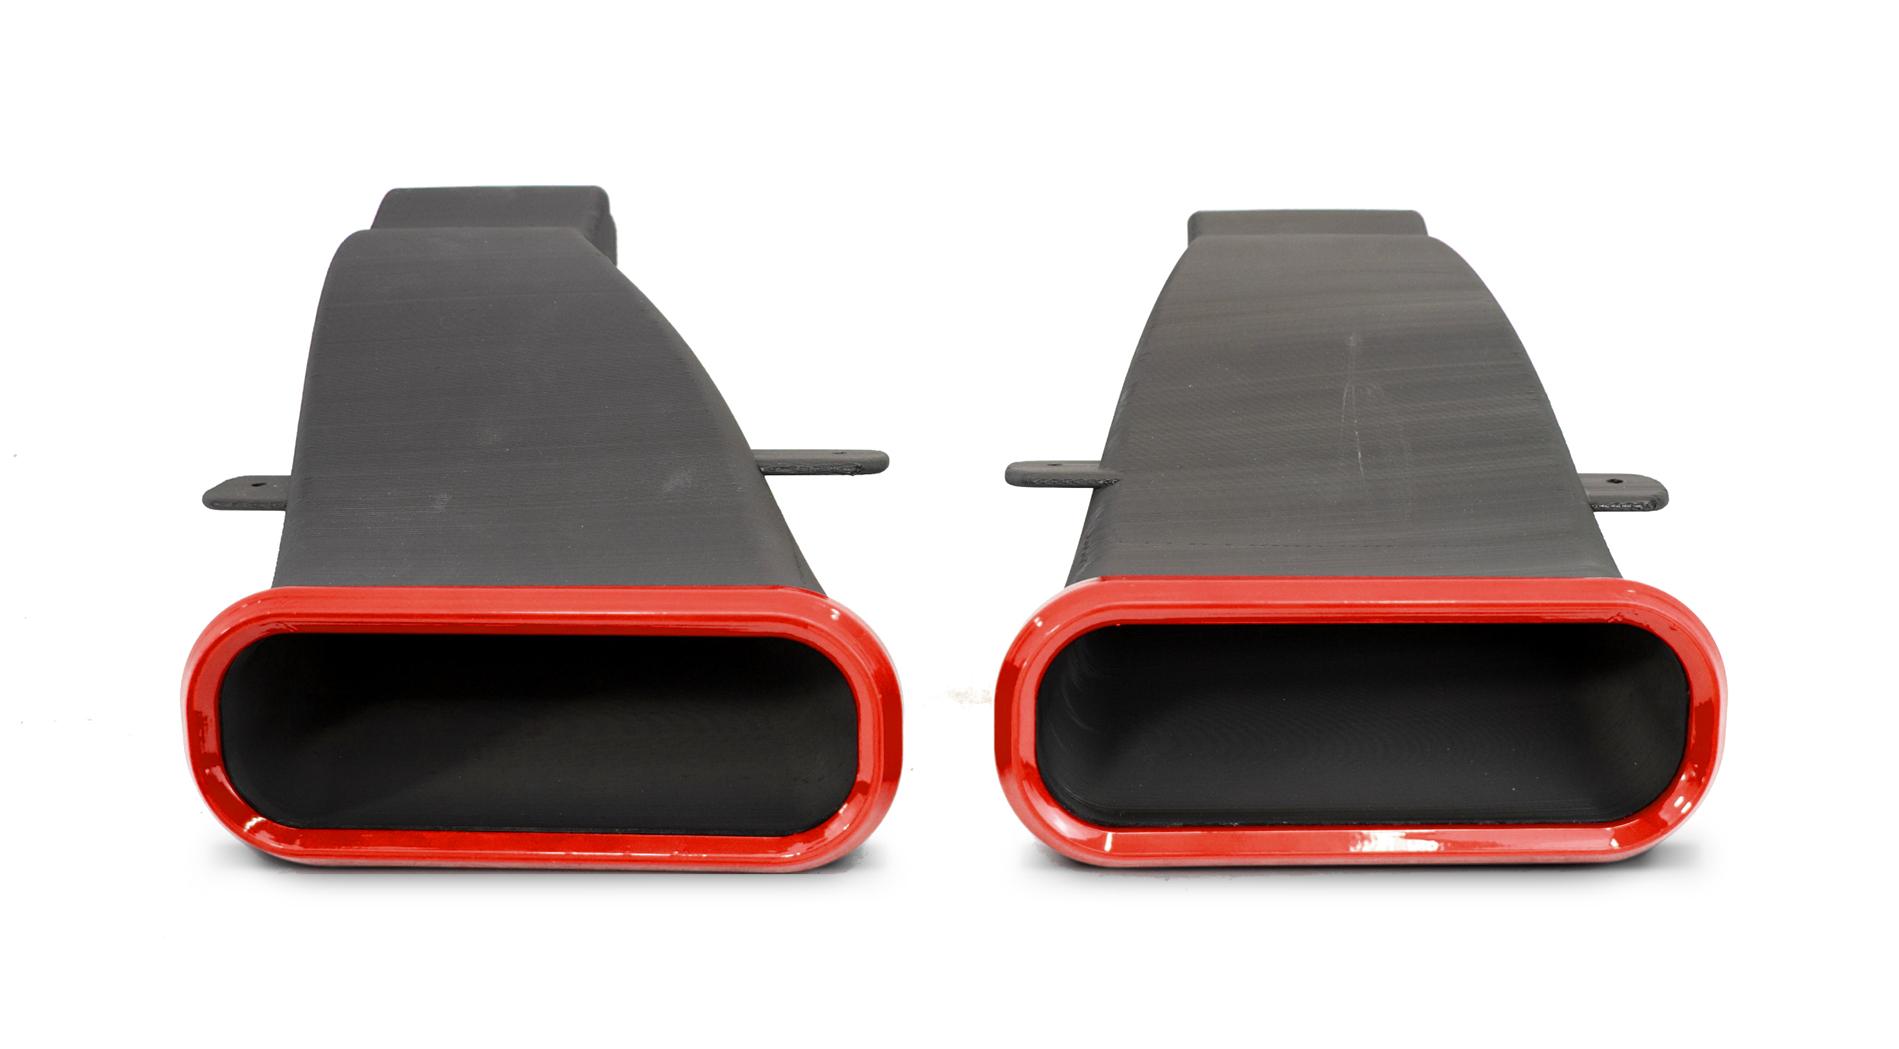 velossa-tech-ford-fiesta-mk8-big-mouth-cold-air-intake-red.jpg